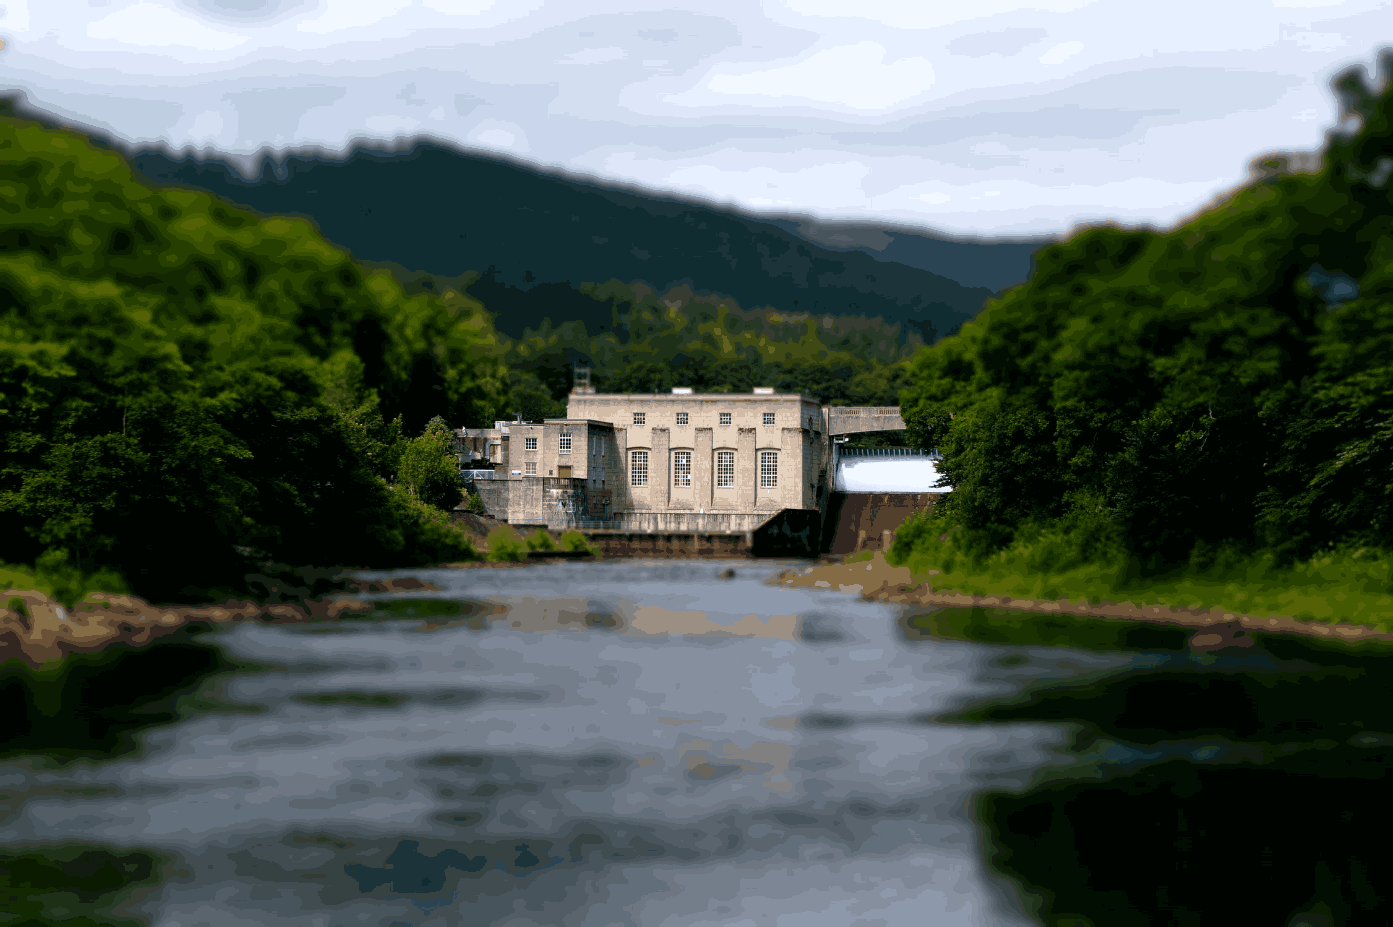 Ware River Power